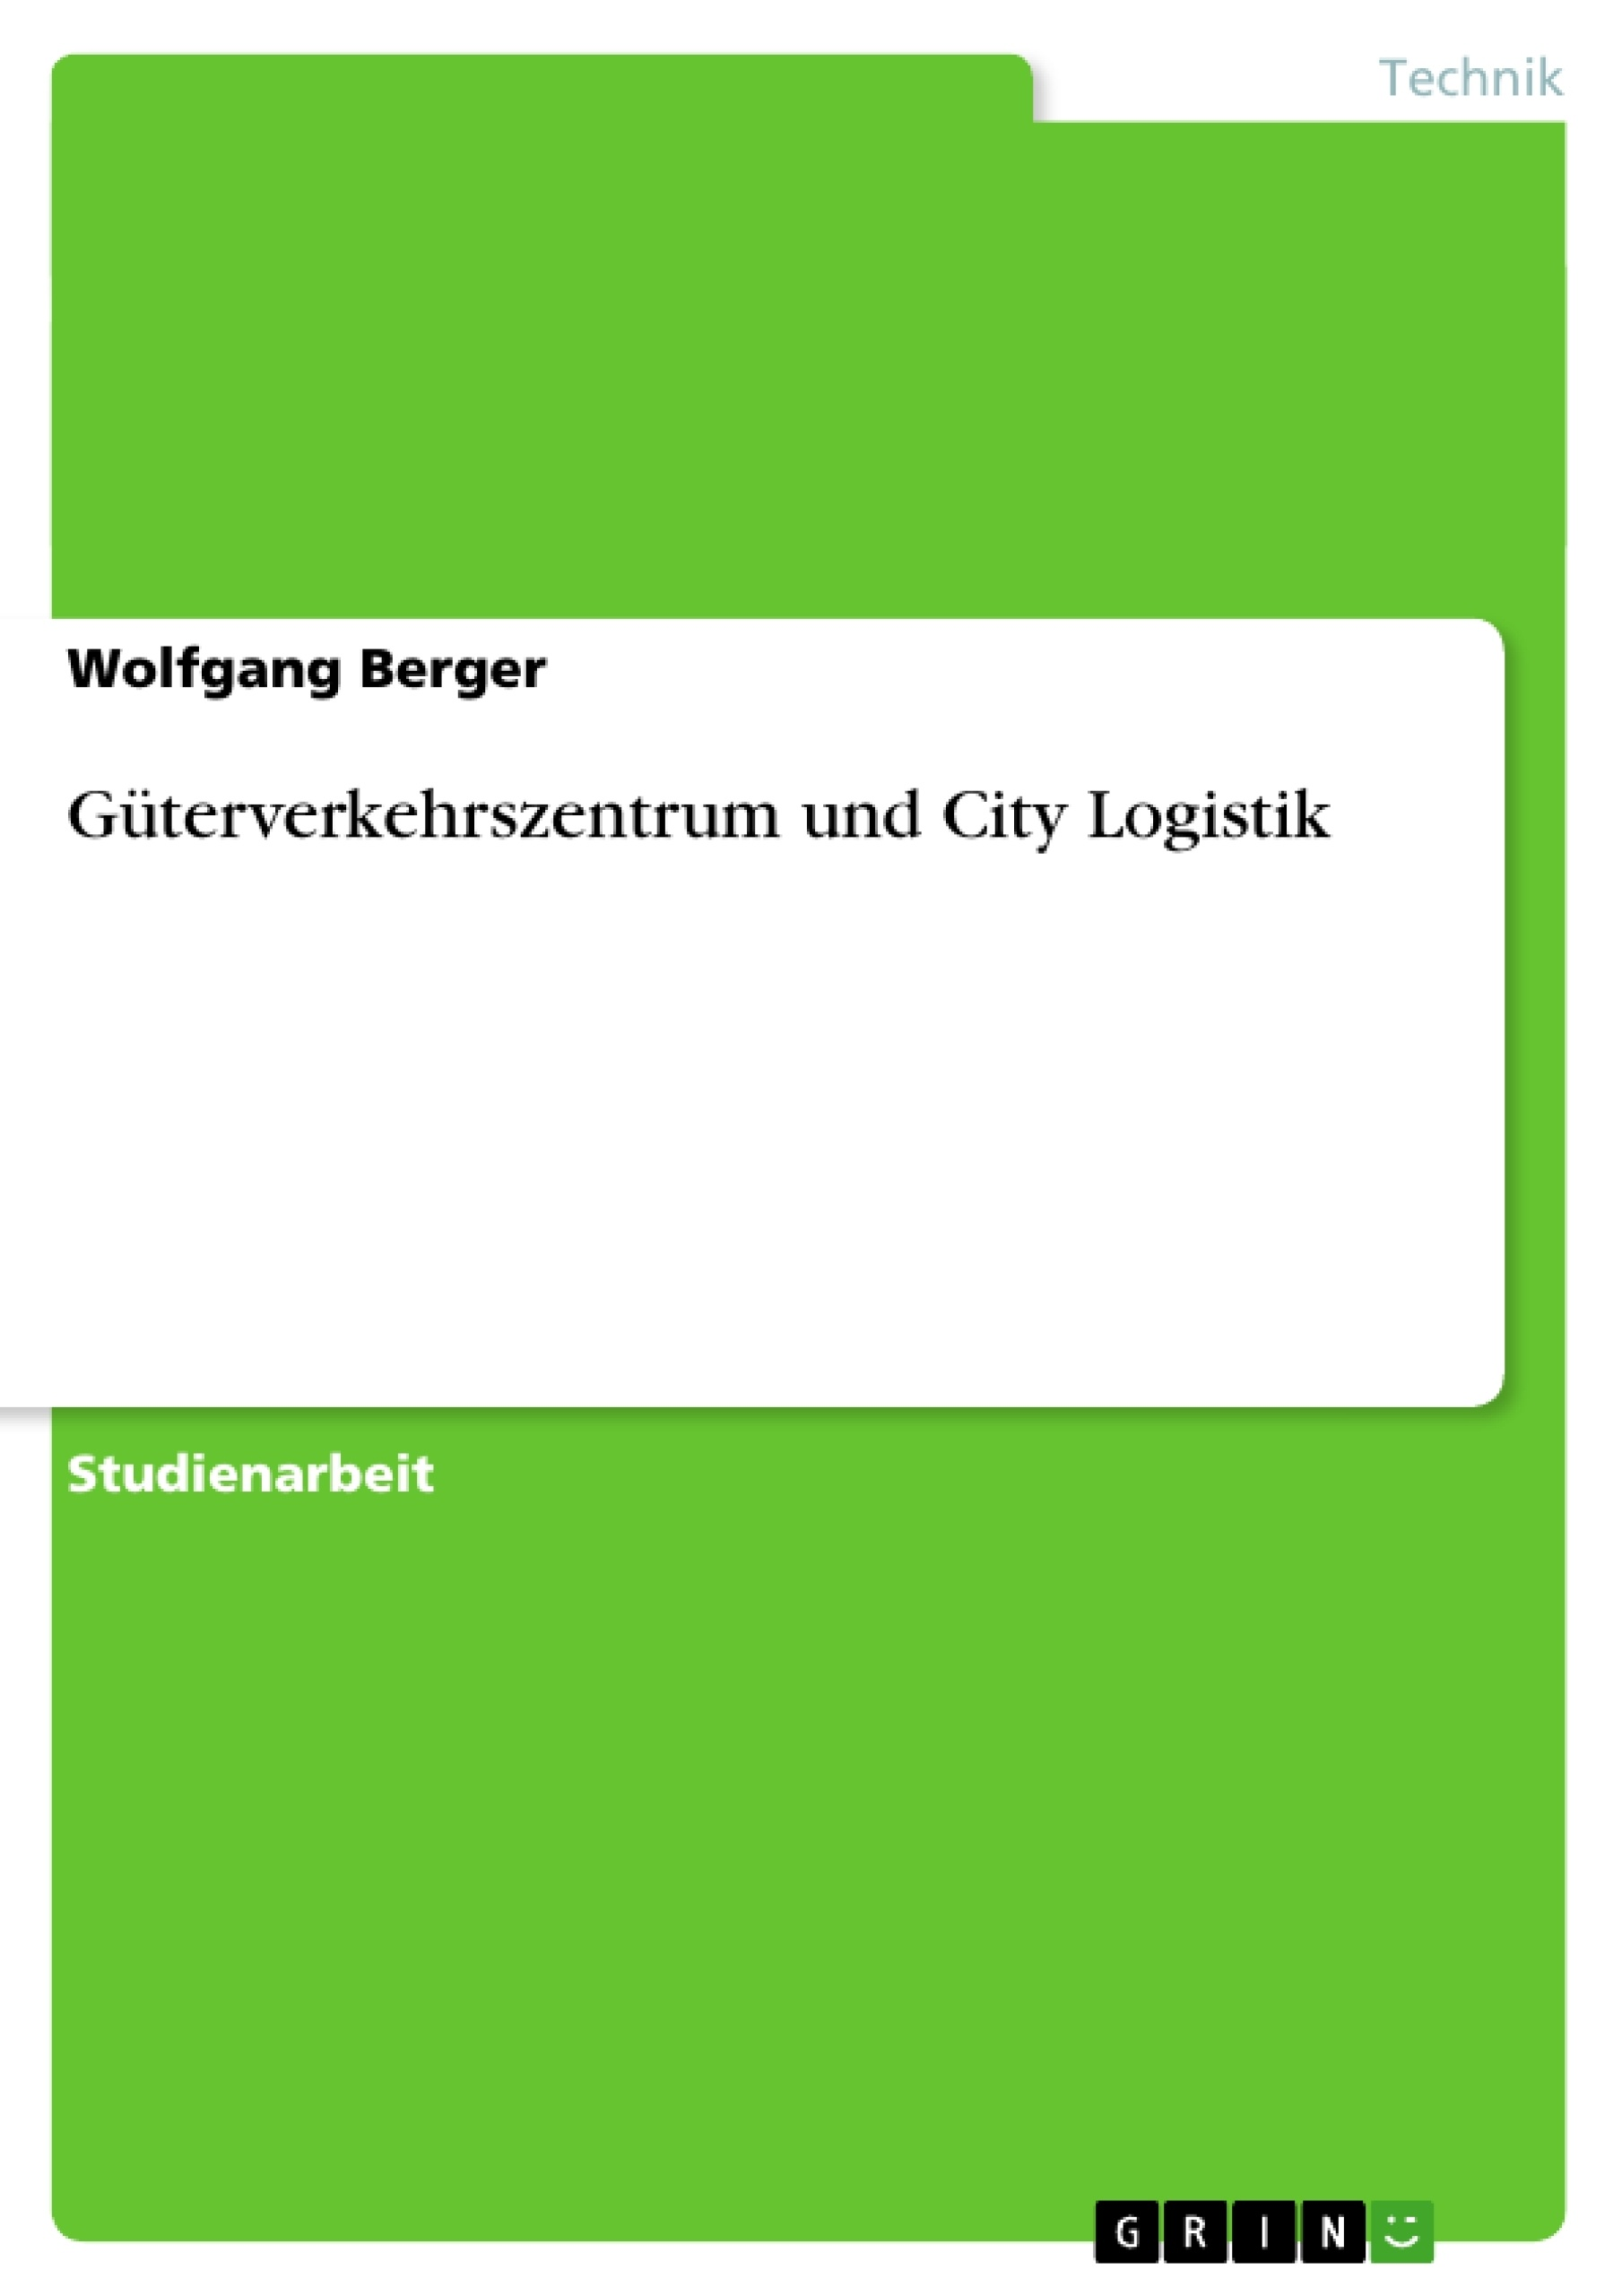 Titel: Güterverkehrszentrum und City Logistik